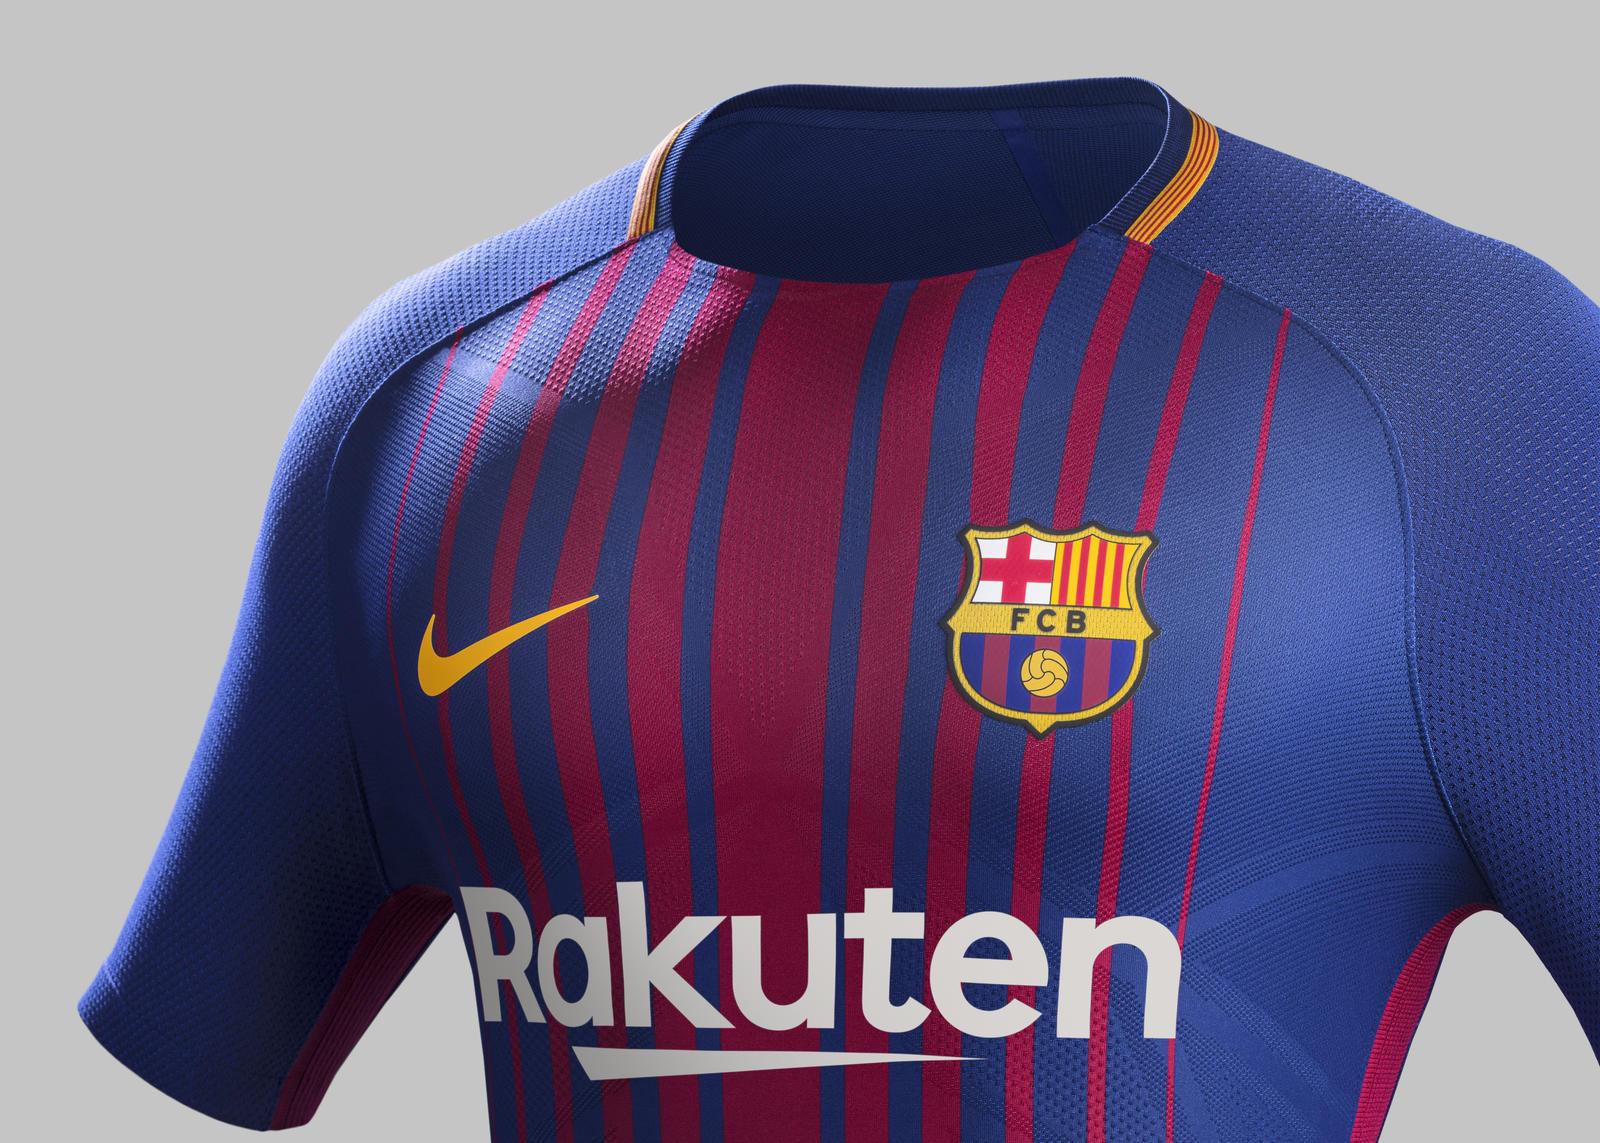 Fy17-18_Club_Kits_H_Crest_Match_FCB_R_rectangle_1600.jpg